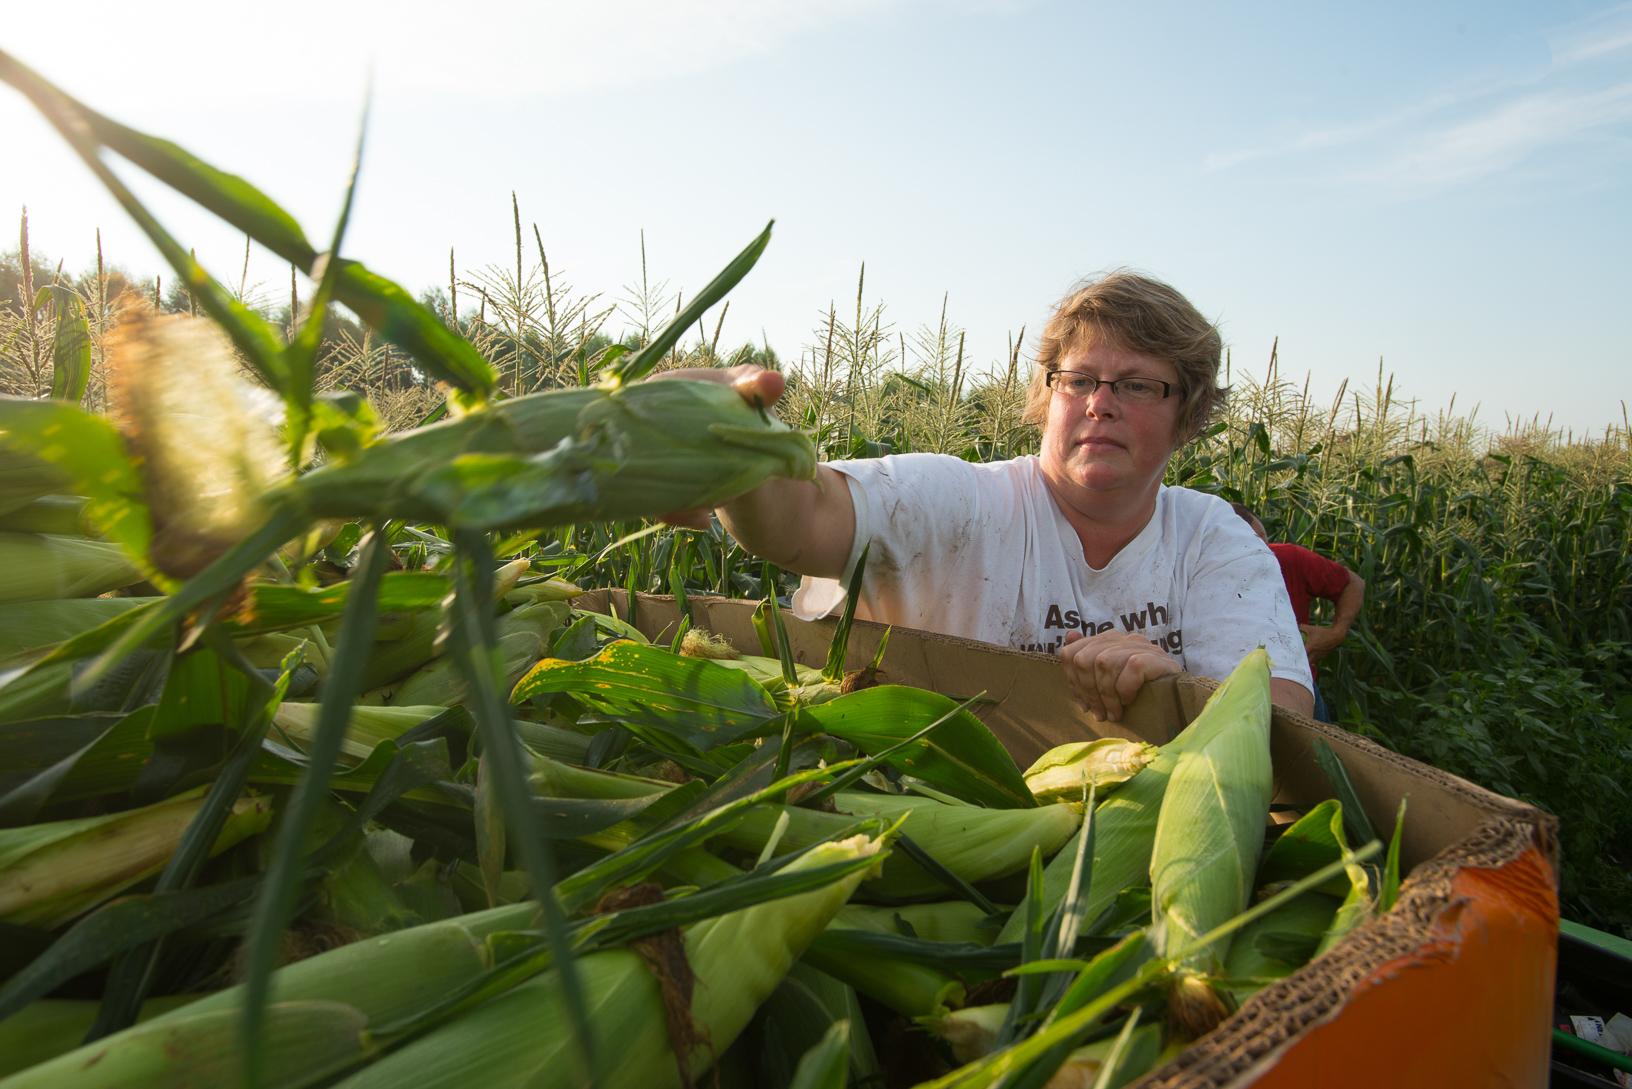 The Van Manen Family Farm in Kellogg grows sweet corn for the Food Bank of Iowa. Photo credit: Joseph L. Murphy/Iowa Soybean Association